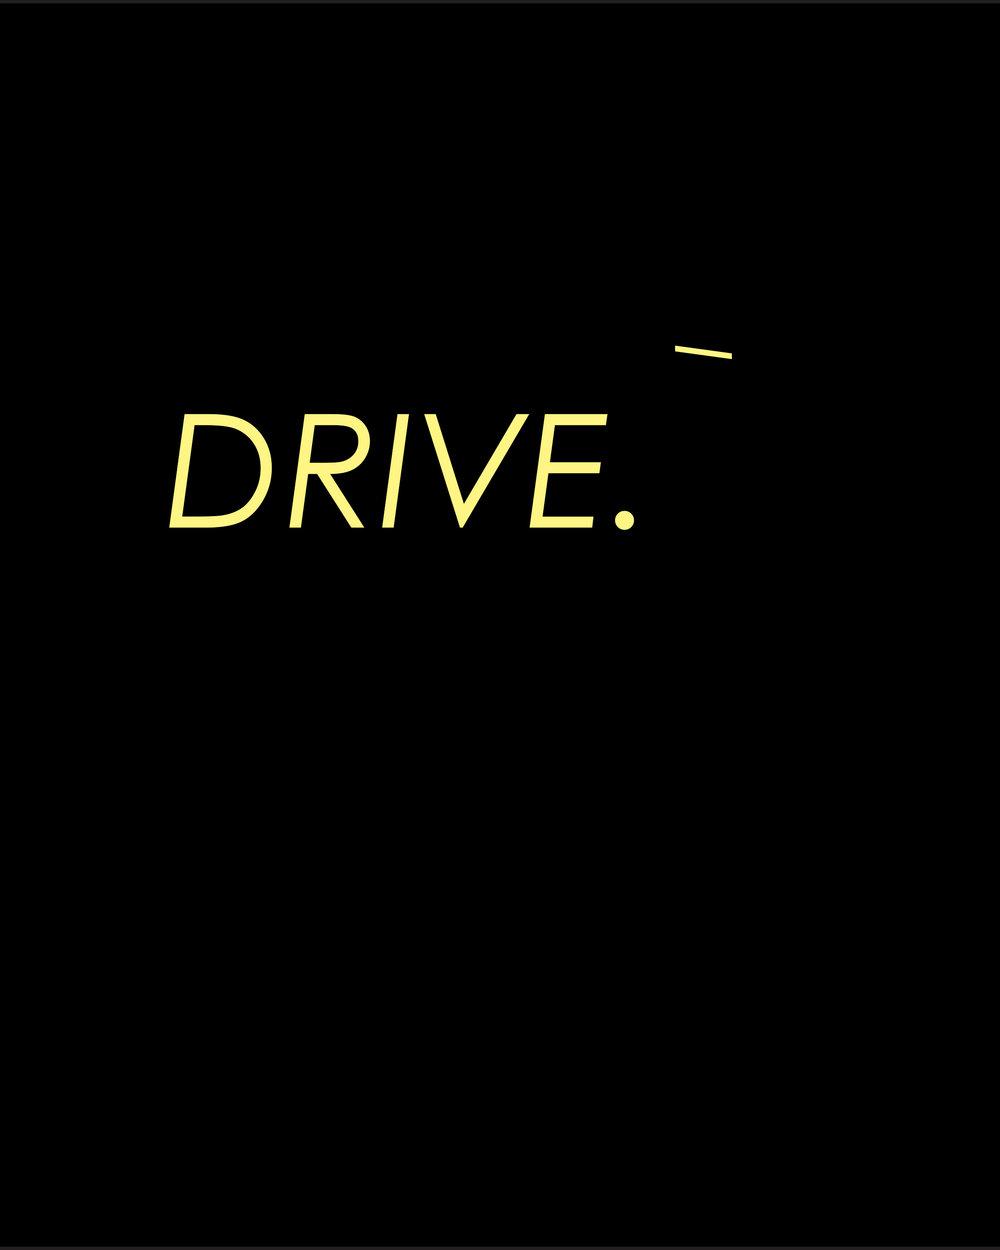 Drive Part I-1.jpg